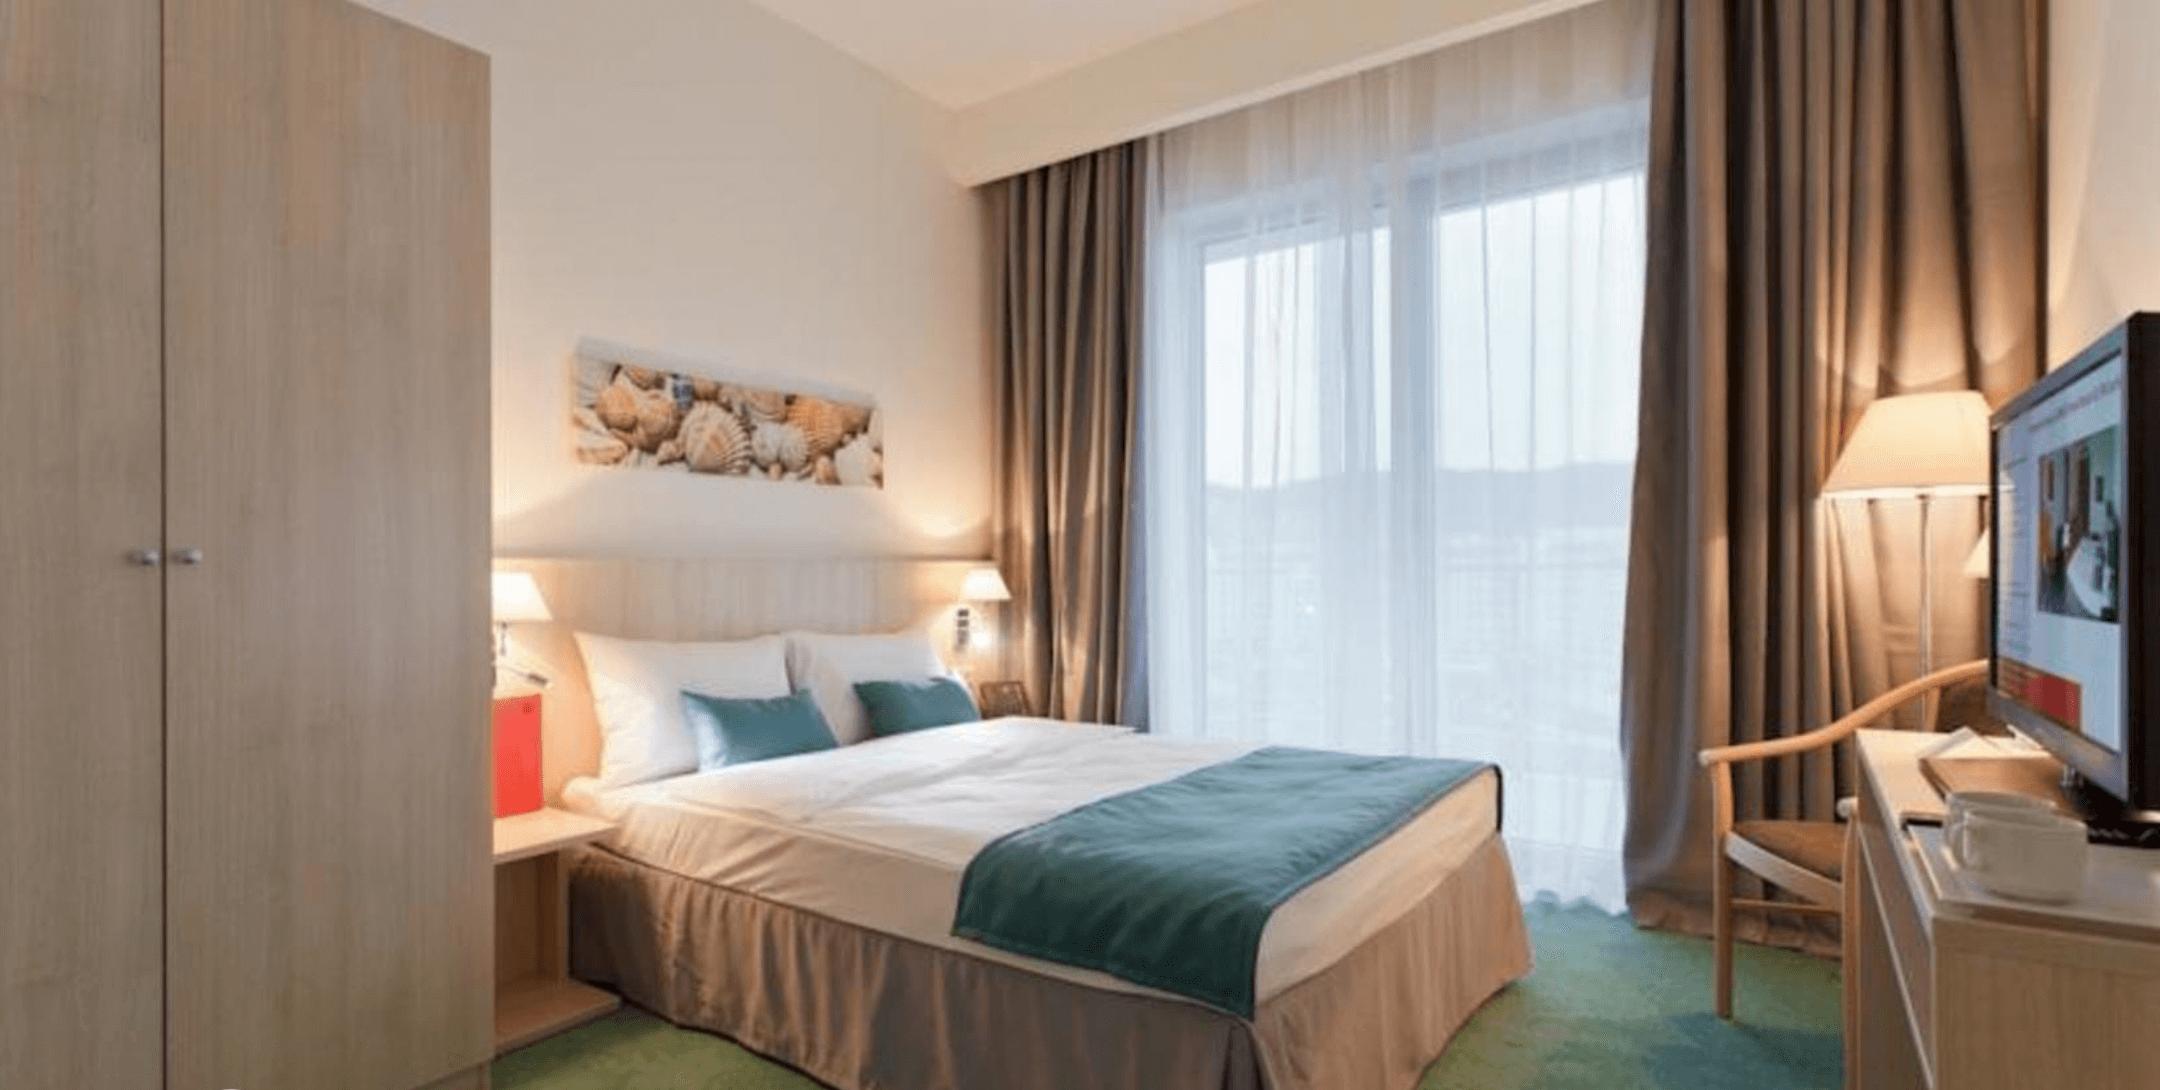 Тур на Имеретинский курорт в Адлер в ОК Сочи Парк Отель 3* на 7 ночей с 31.03.19 от 19 561 рубля (BB) на двоих